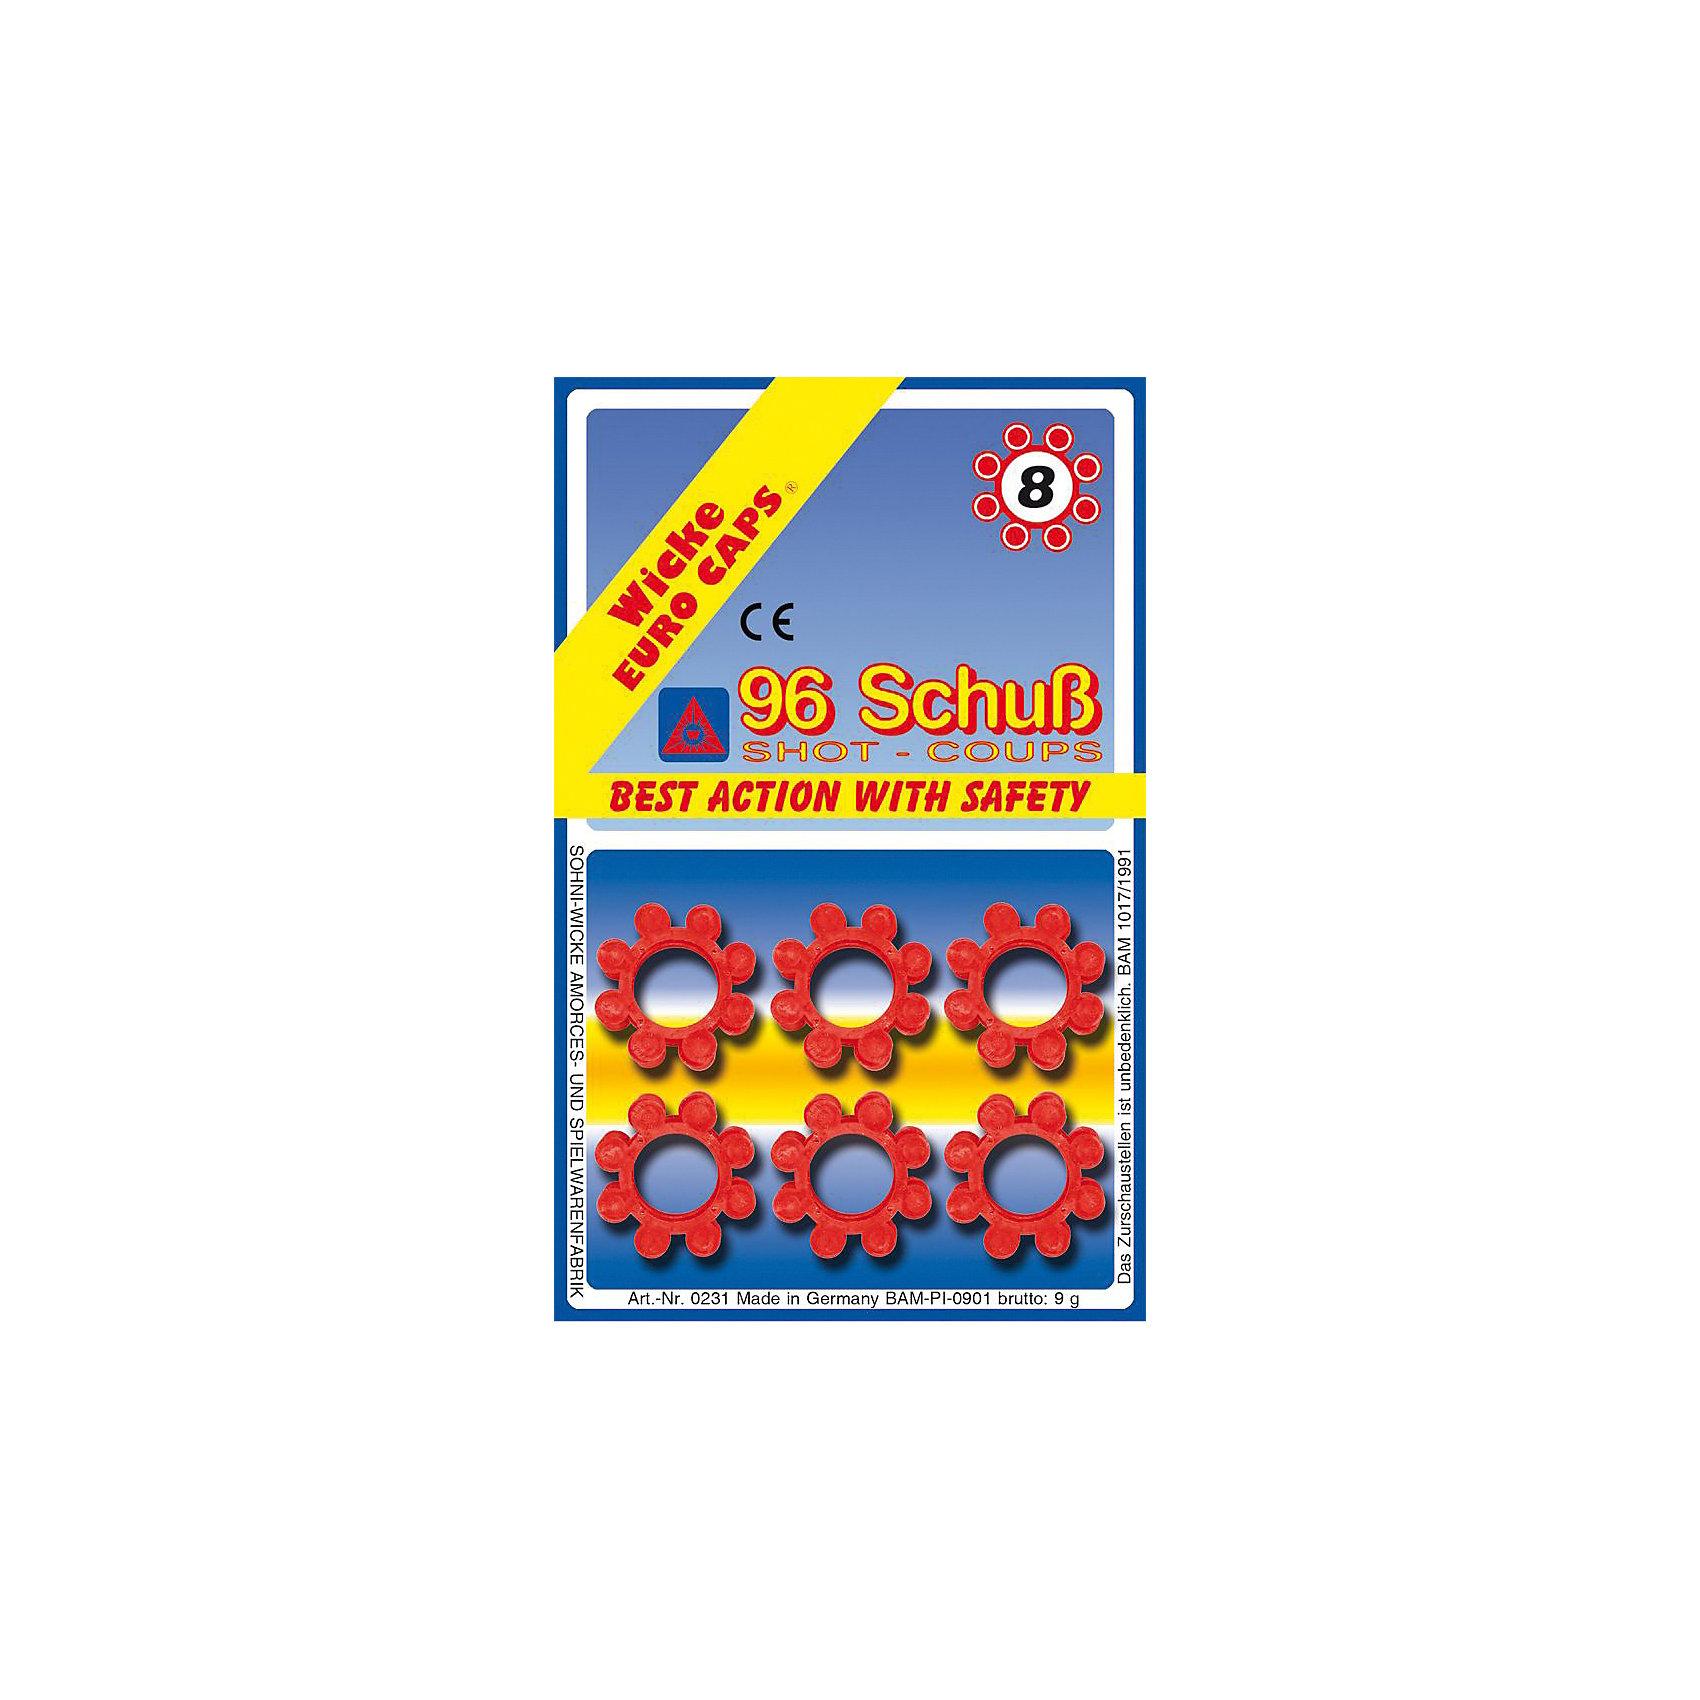 - 8-зарядные пистоны, 96 шт,  Sohni-Wicke